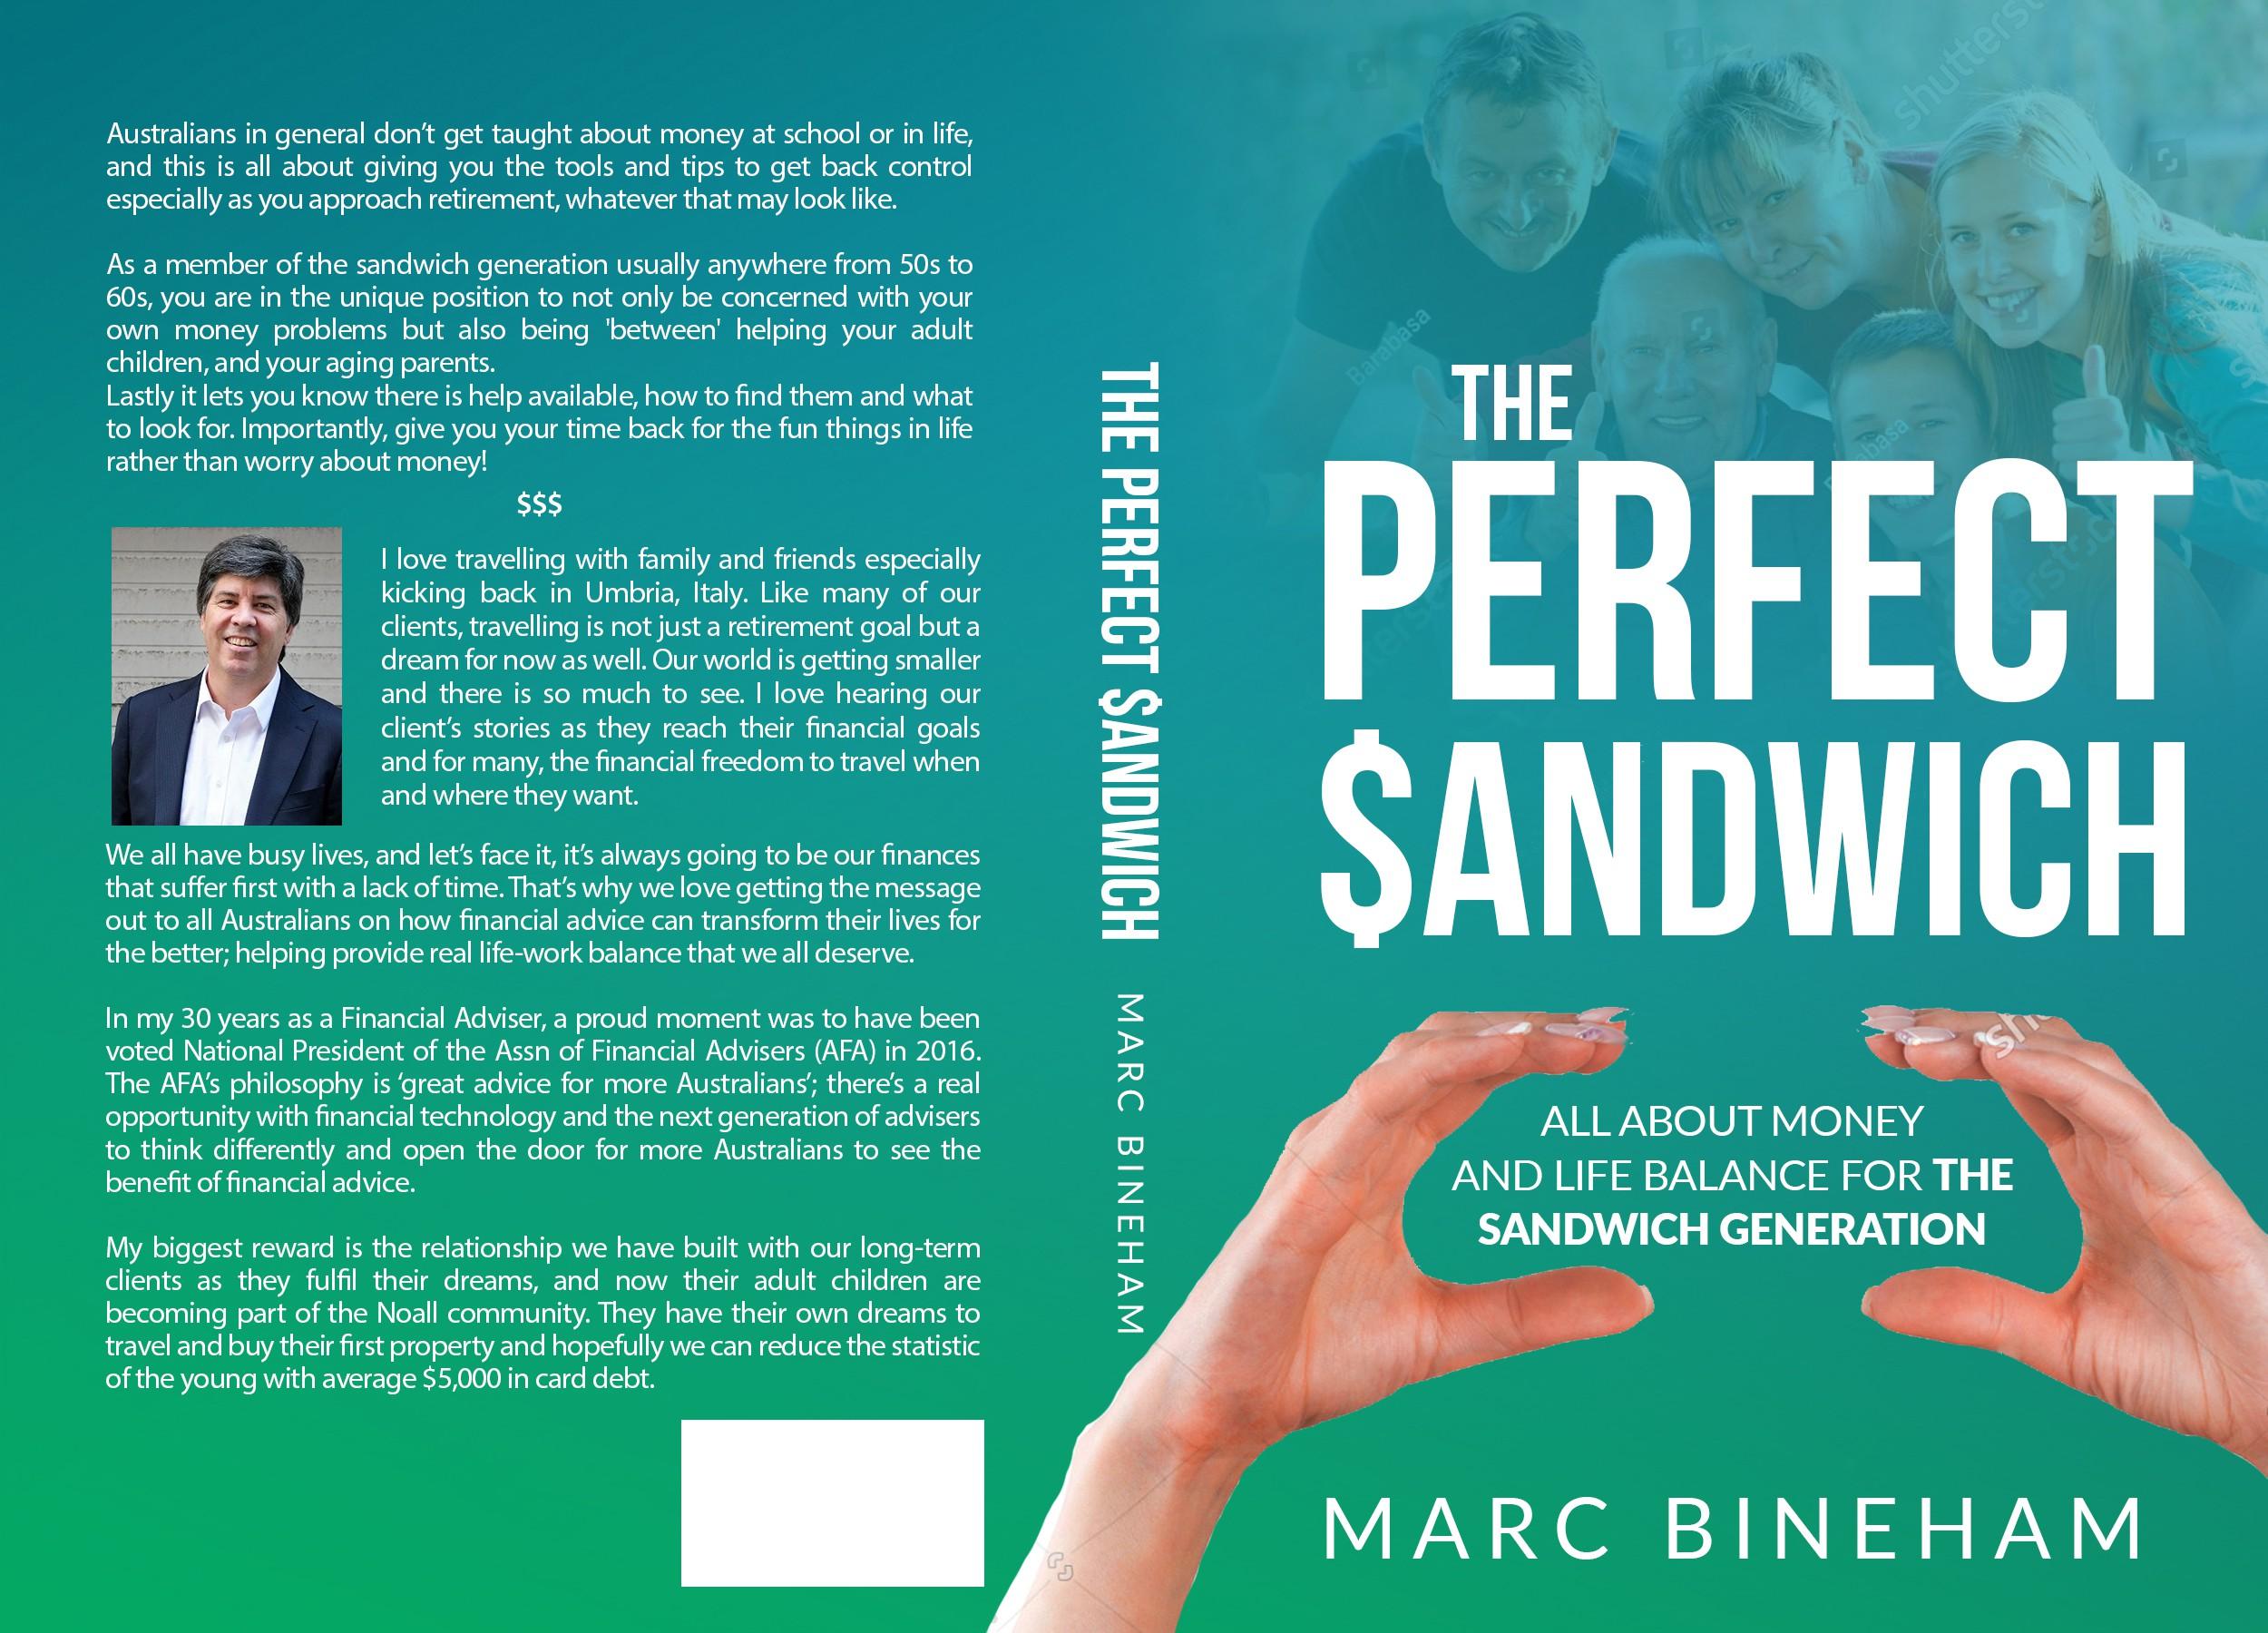 The Perfect Sandwich Book Cover Contest